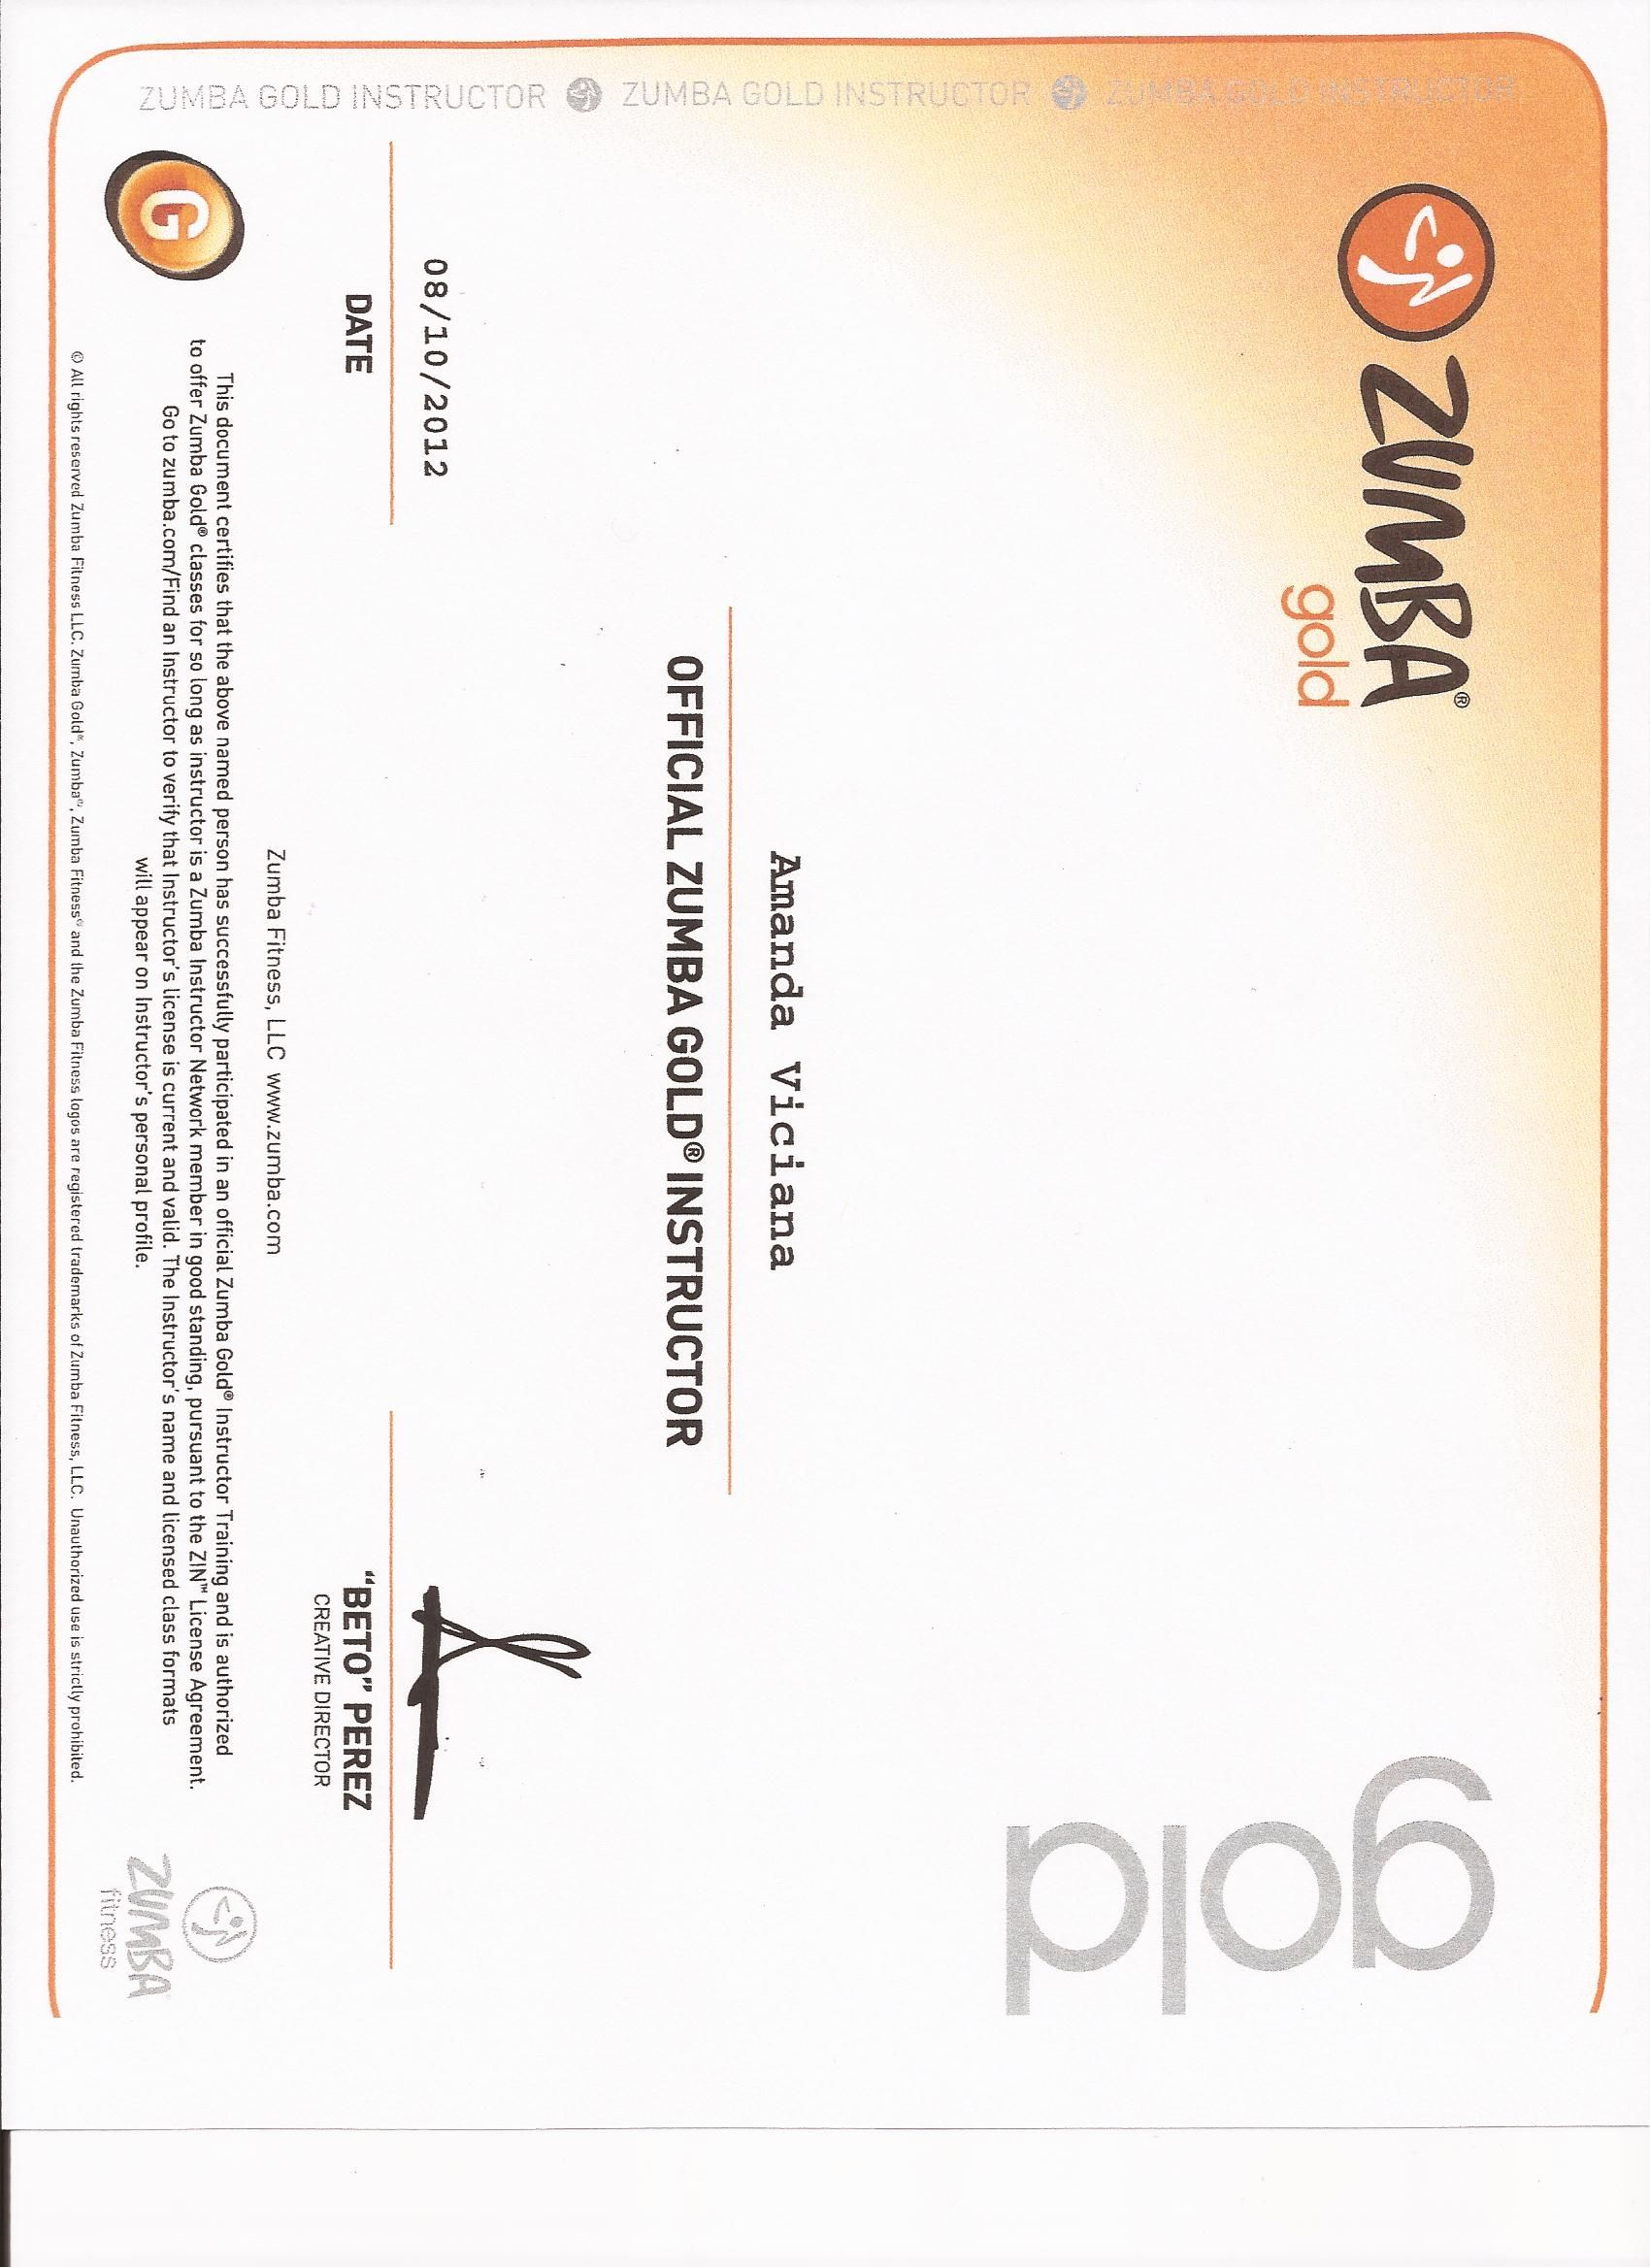 Zumba Gold Certification Work Hard Fitness Zumba Fitness